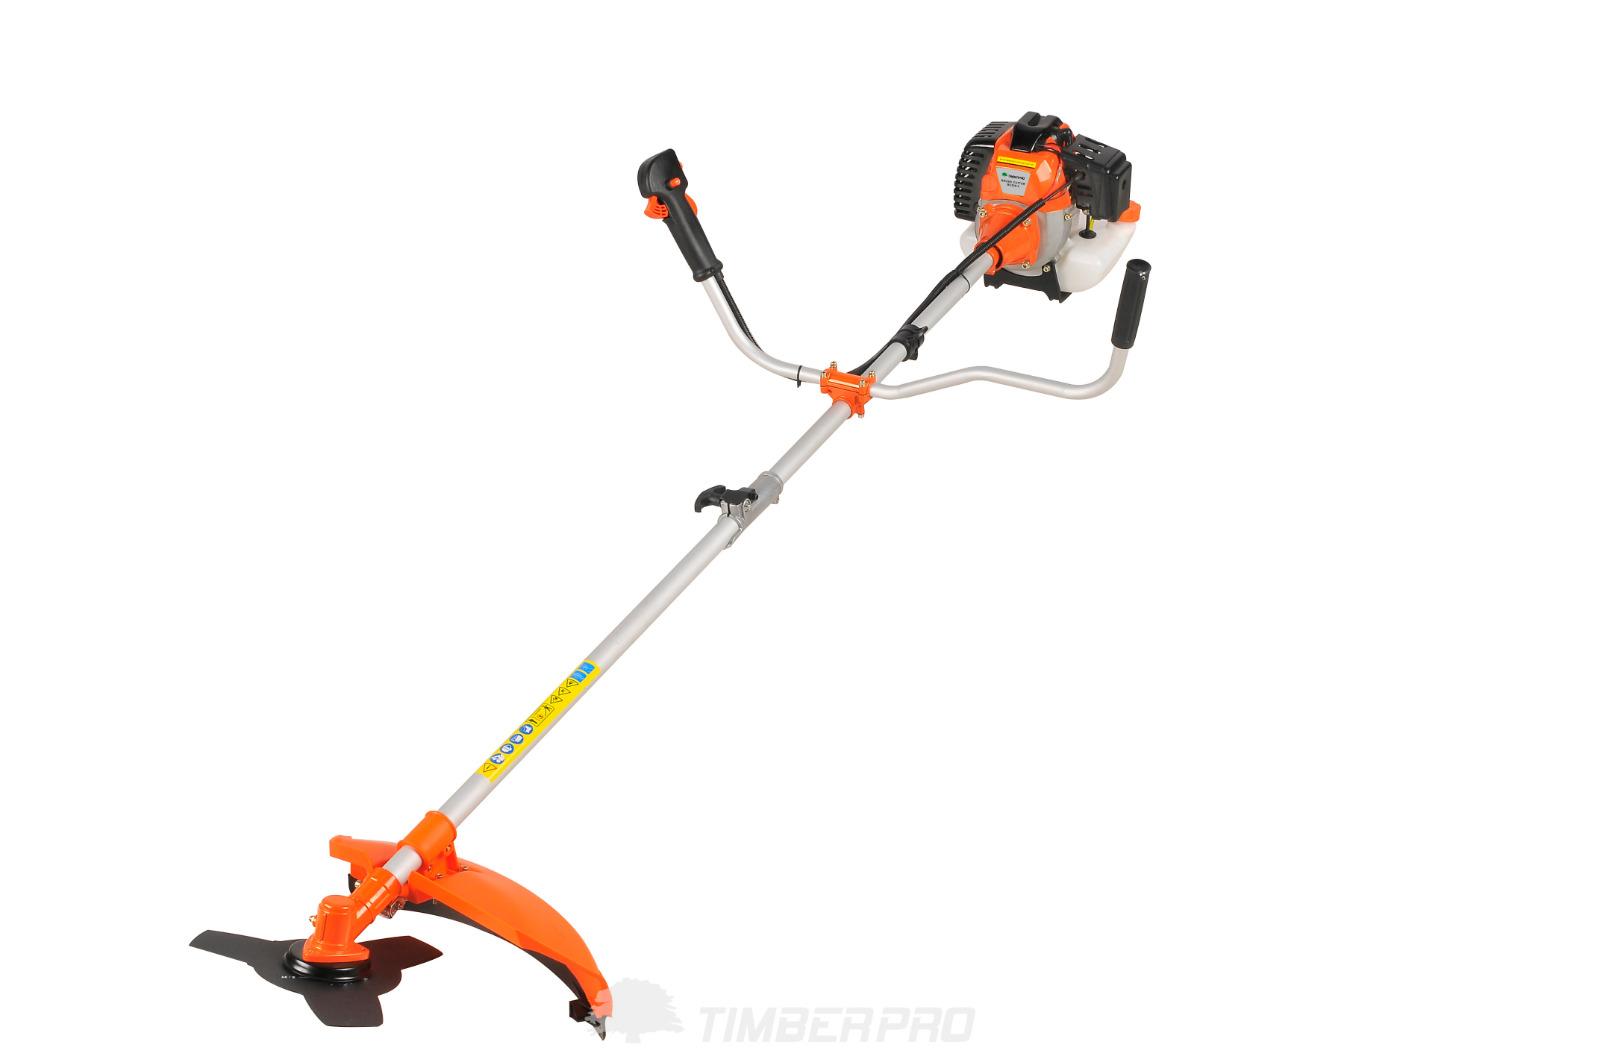 52cc Heavy Duty 2in1 Petrol Strimmer Grass Trimmer Brush